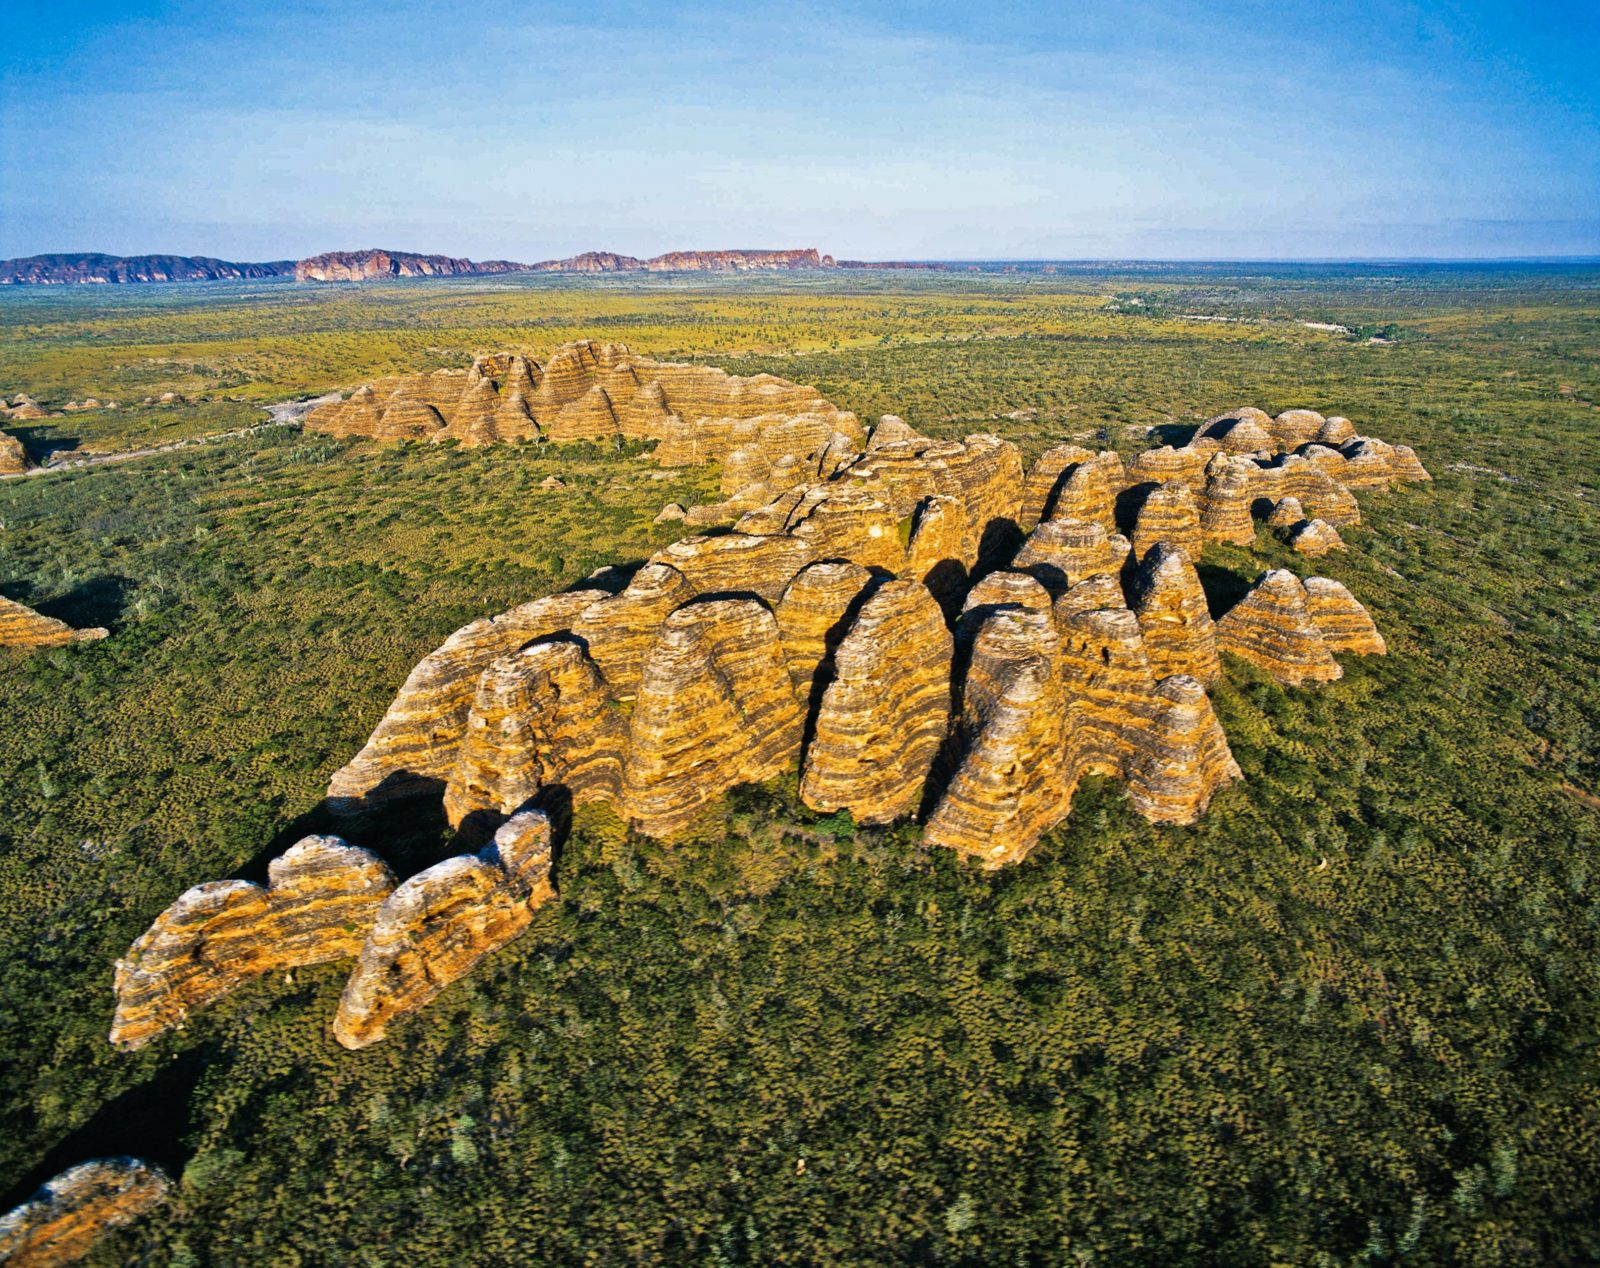 Kingfisher Tours, Kununurra, Western Australia